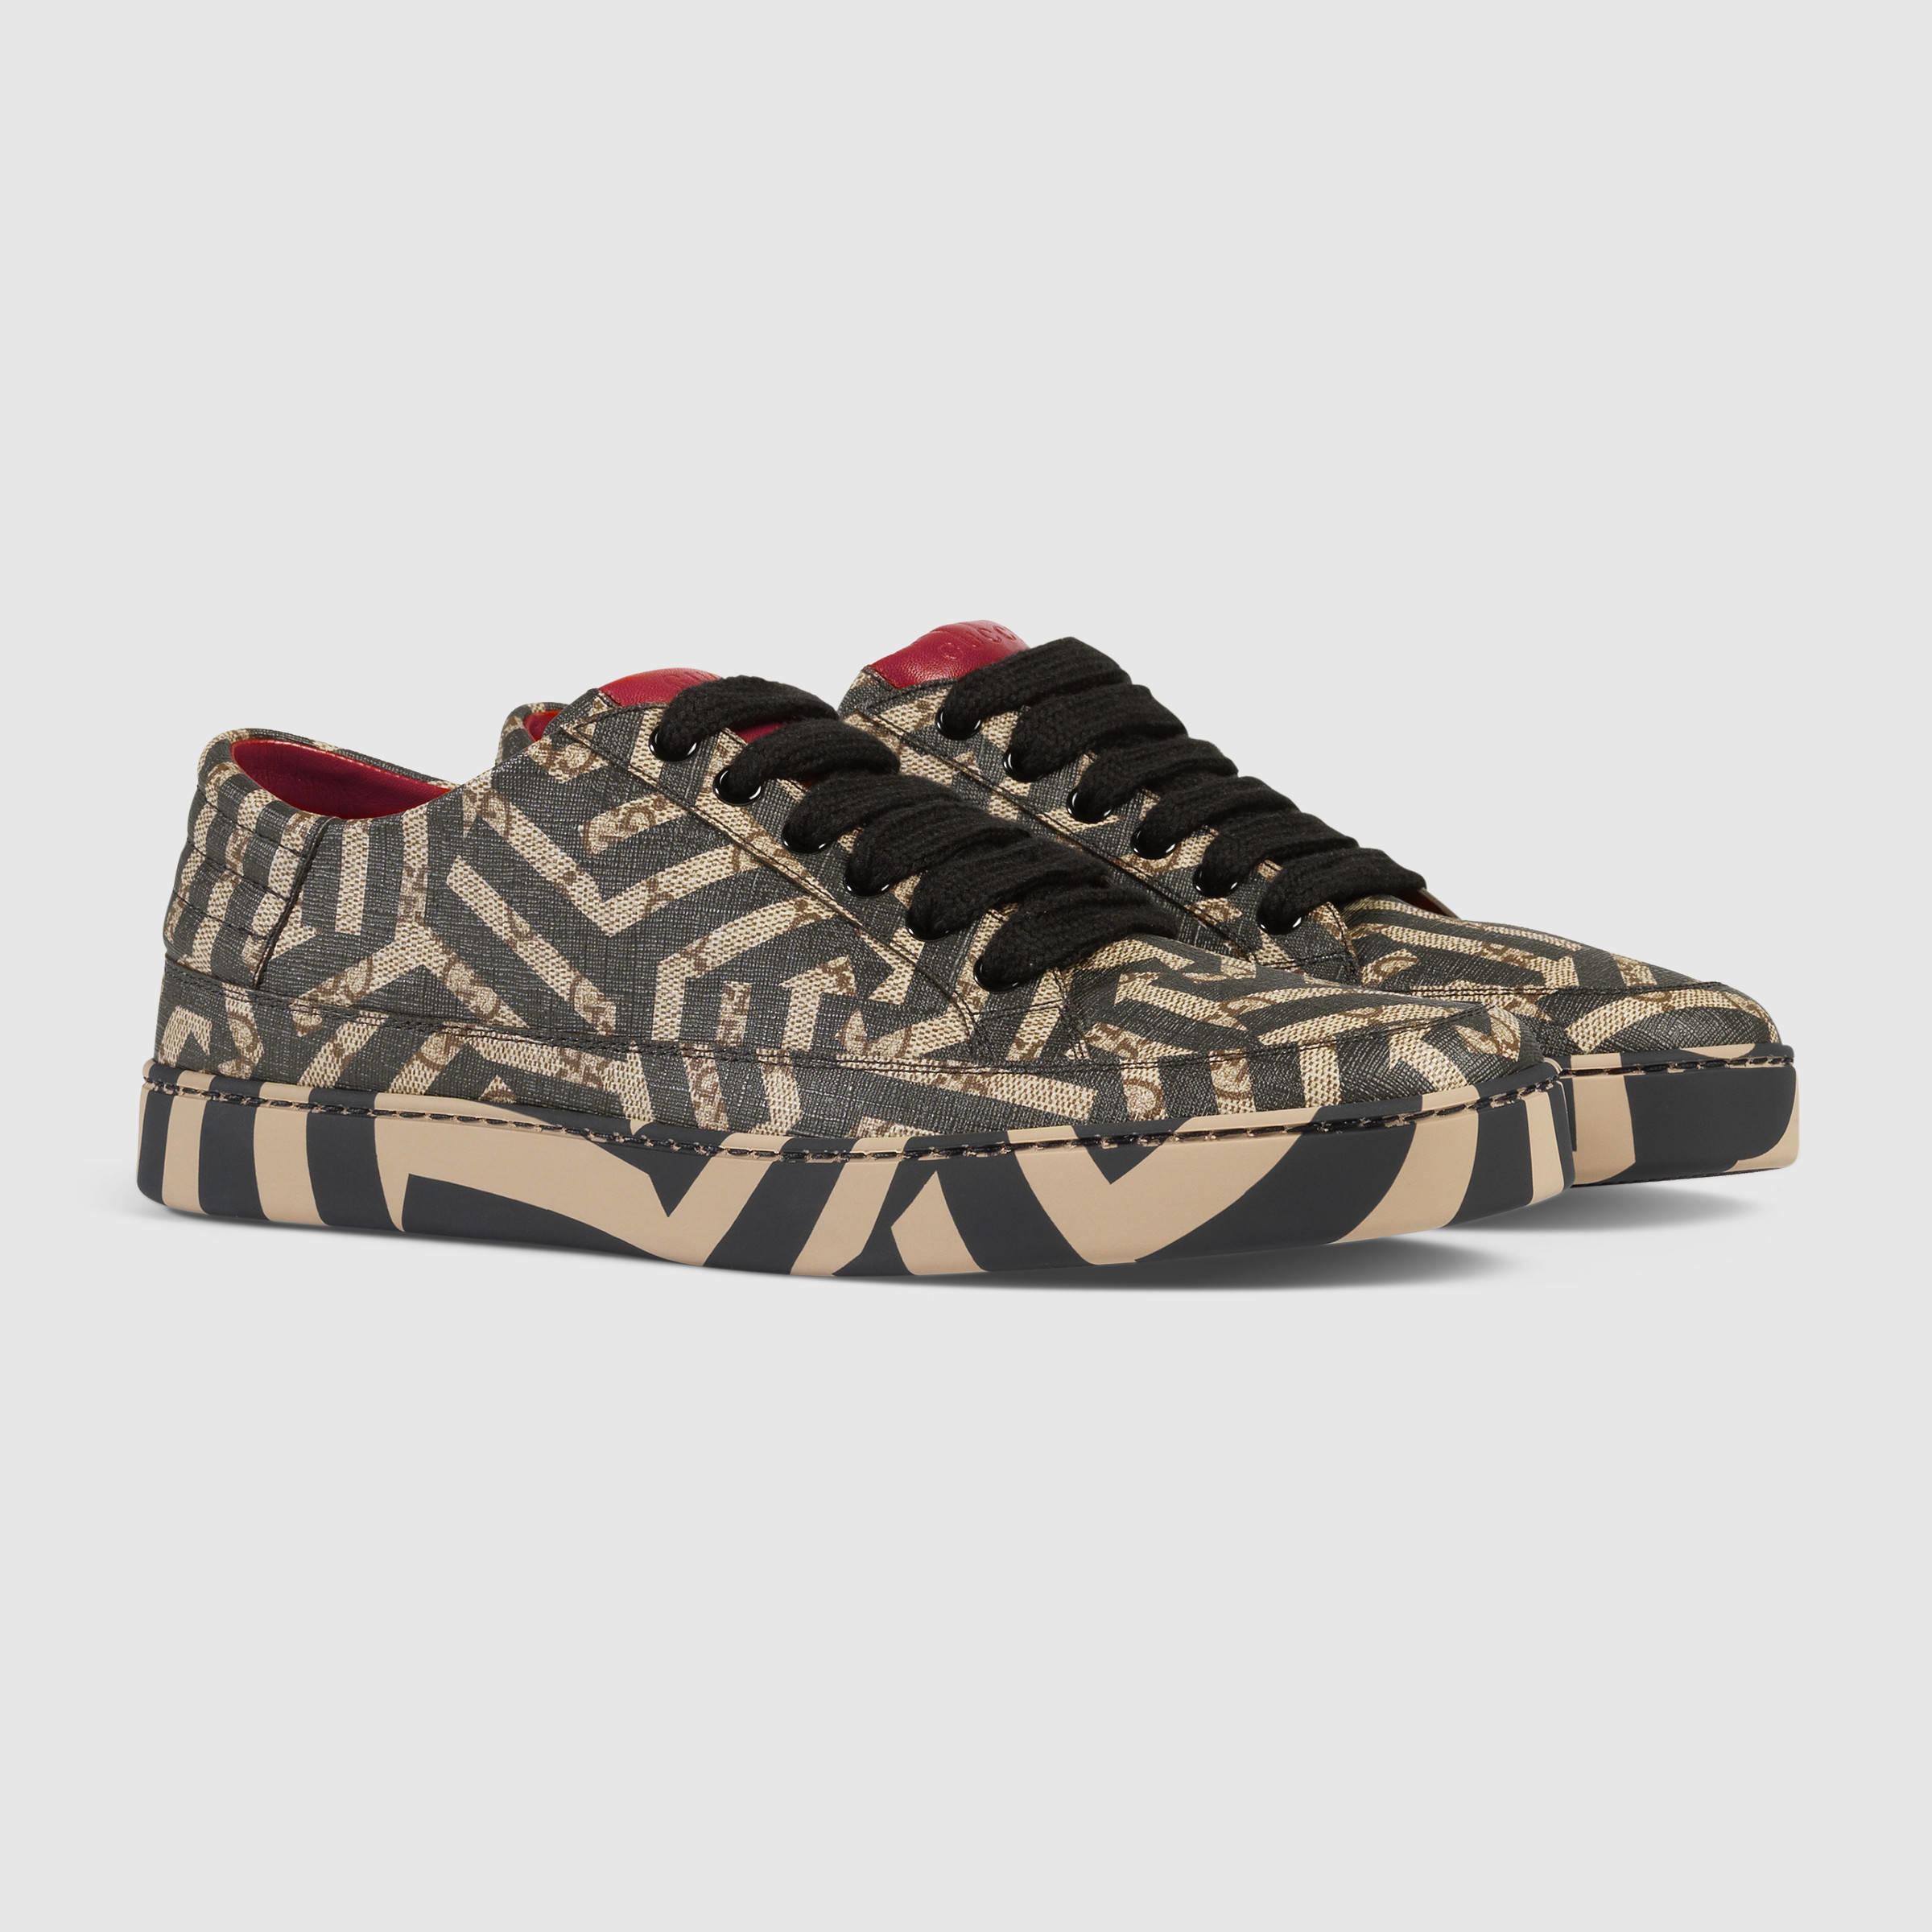 cf90e5ec5839a Gucci Gg Caleido Low-top Sneaker in Brown for Men - Lyst